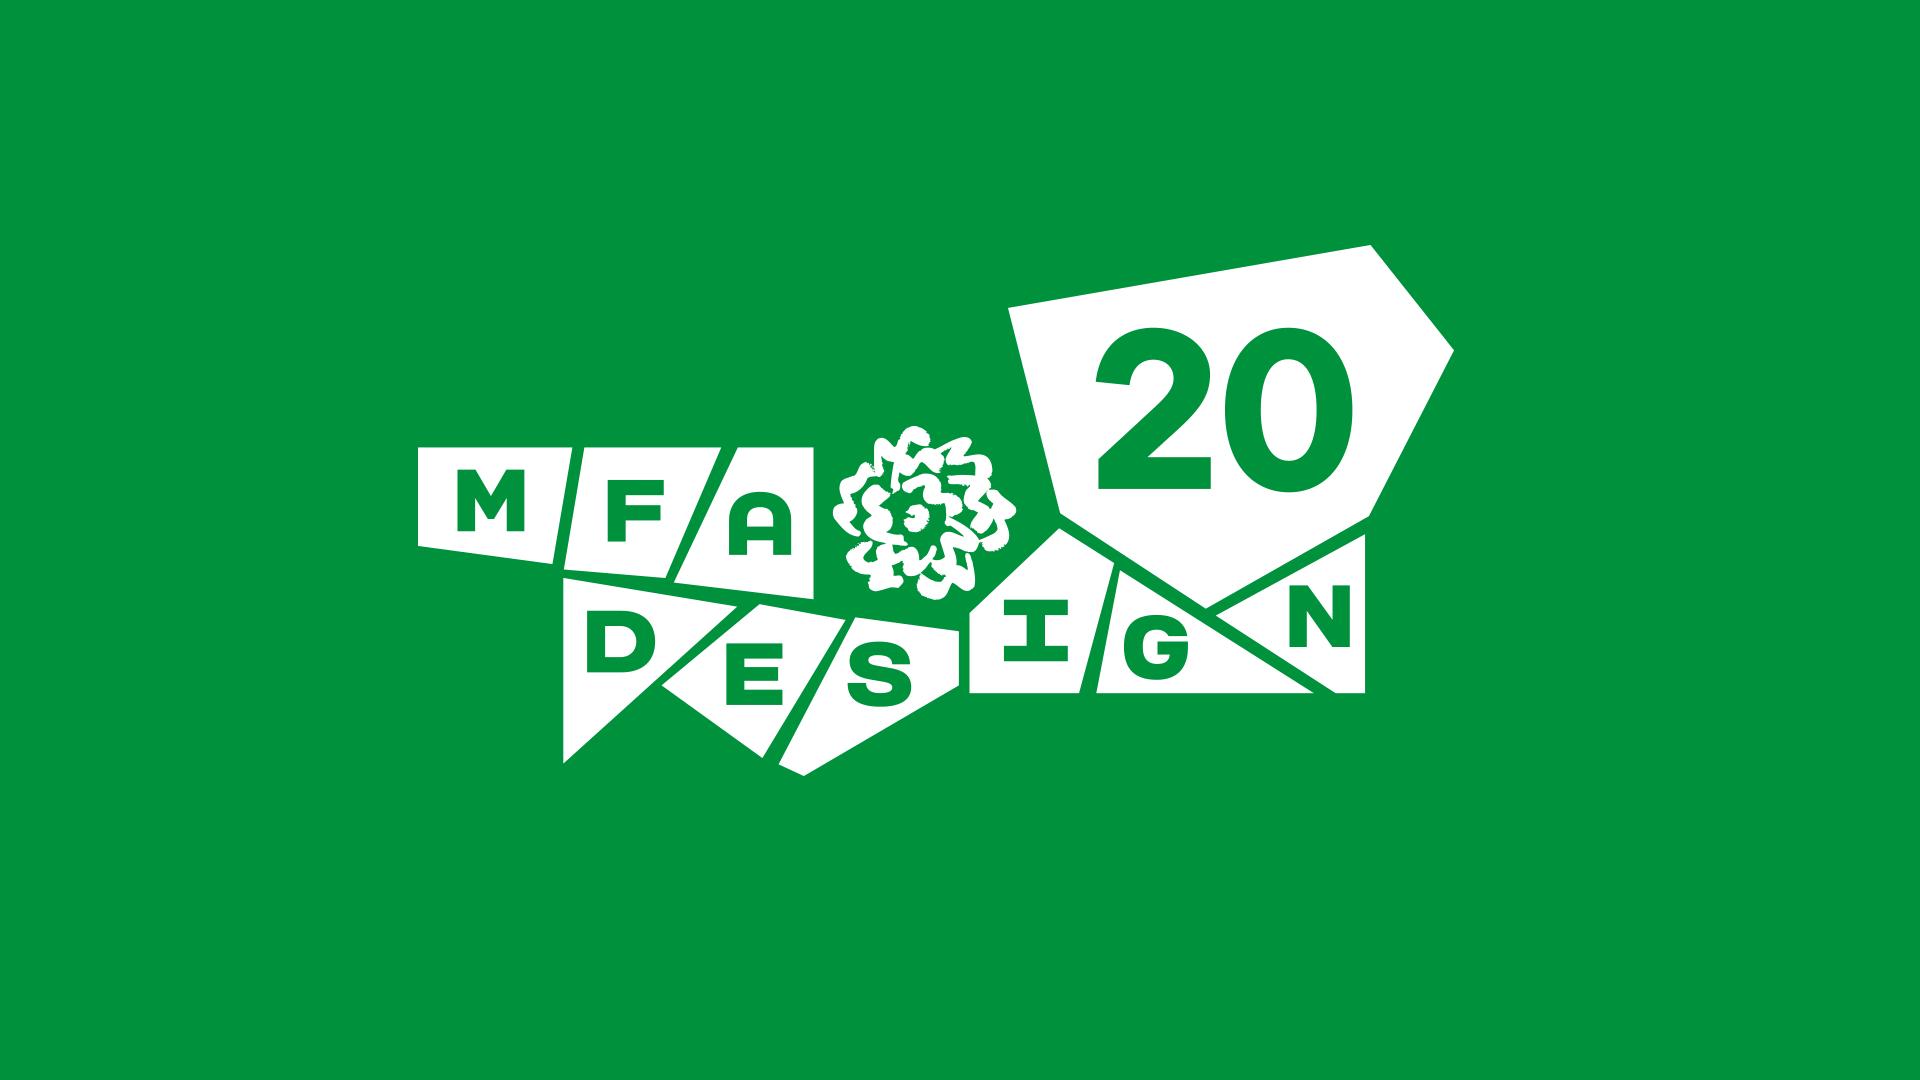 MFA Design logo